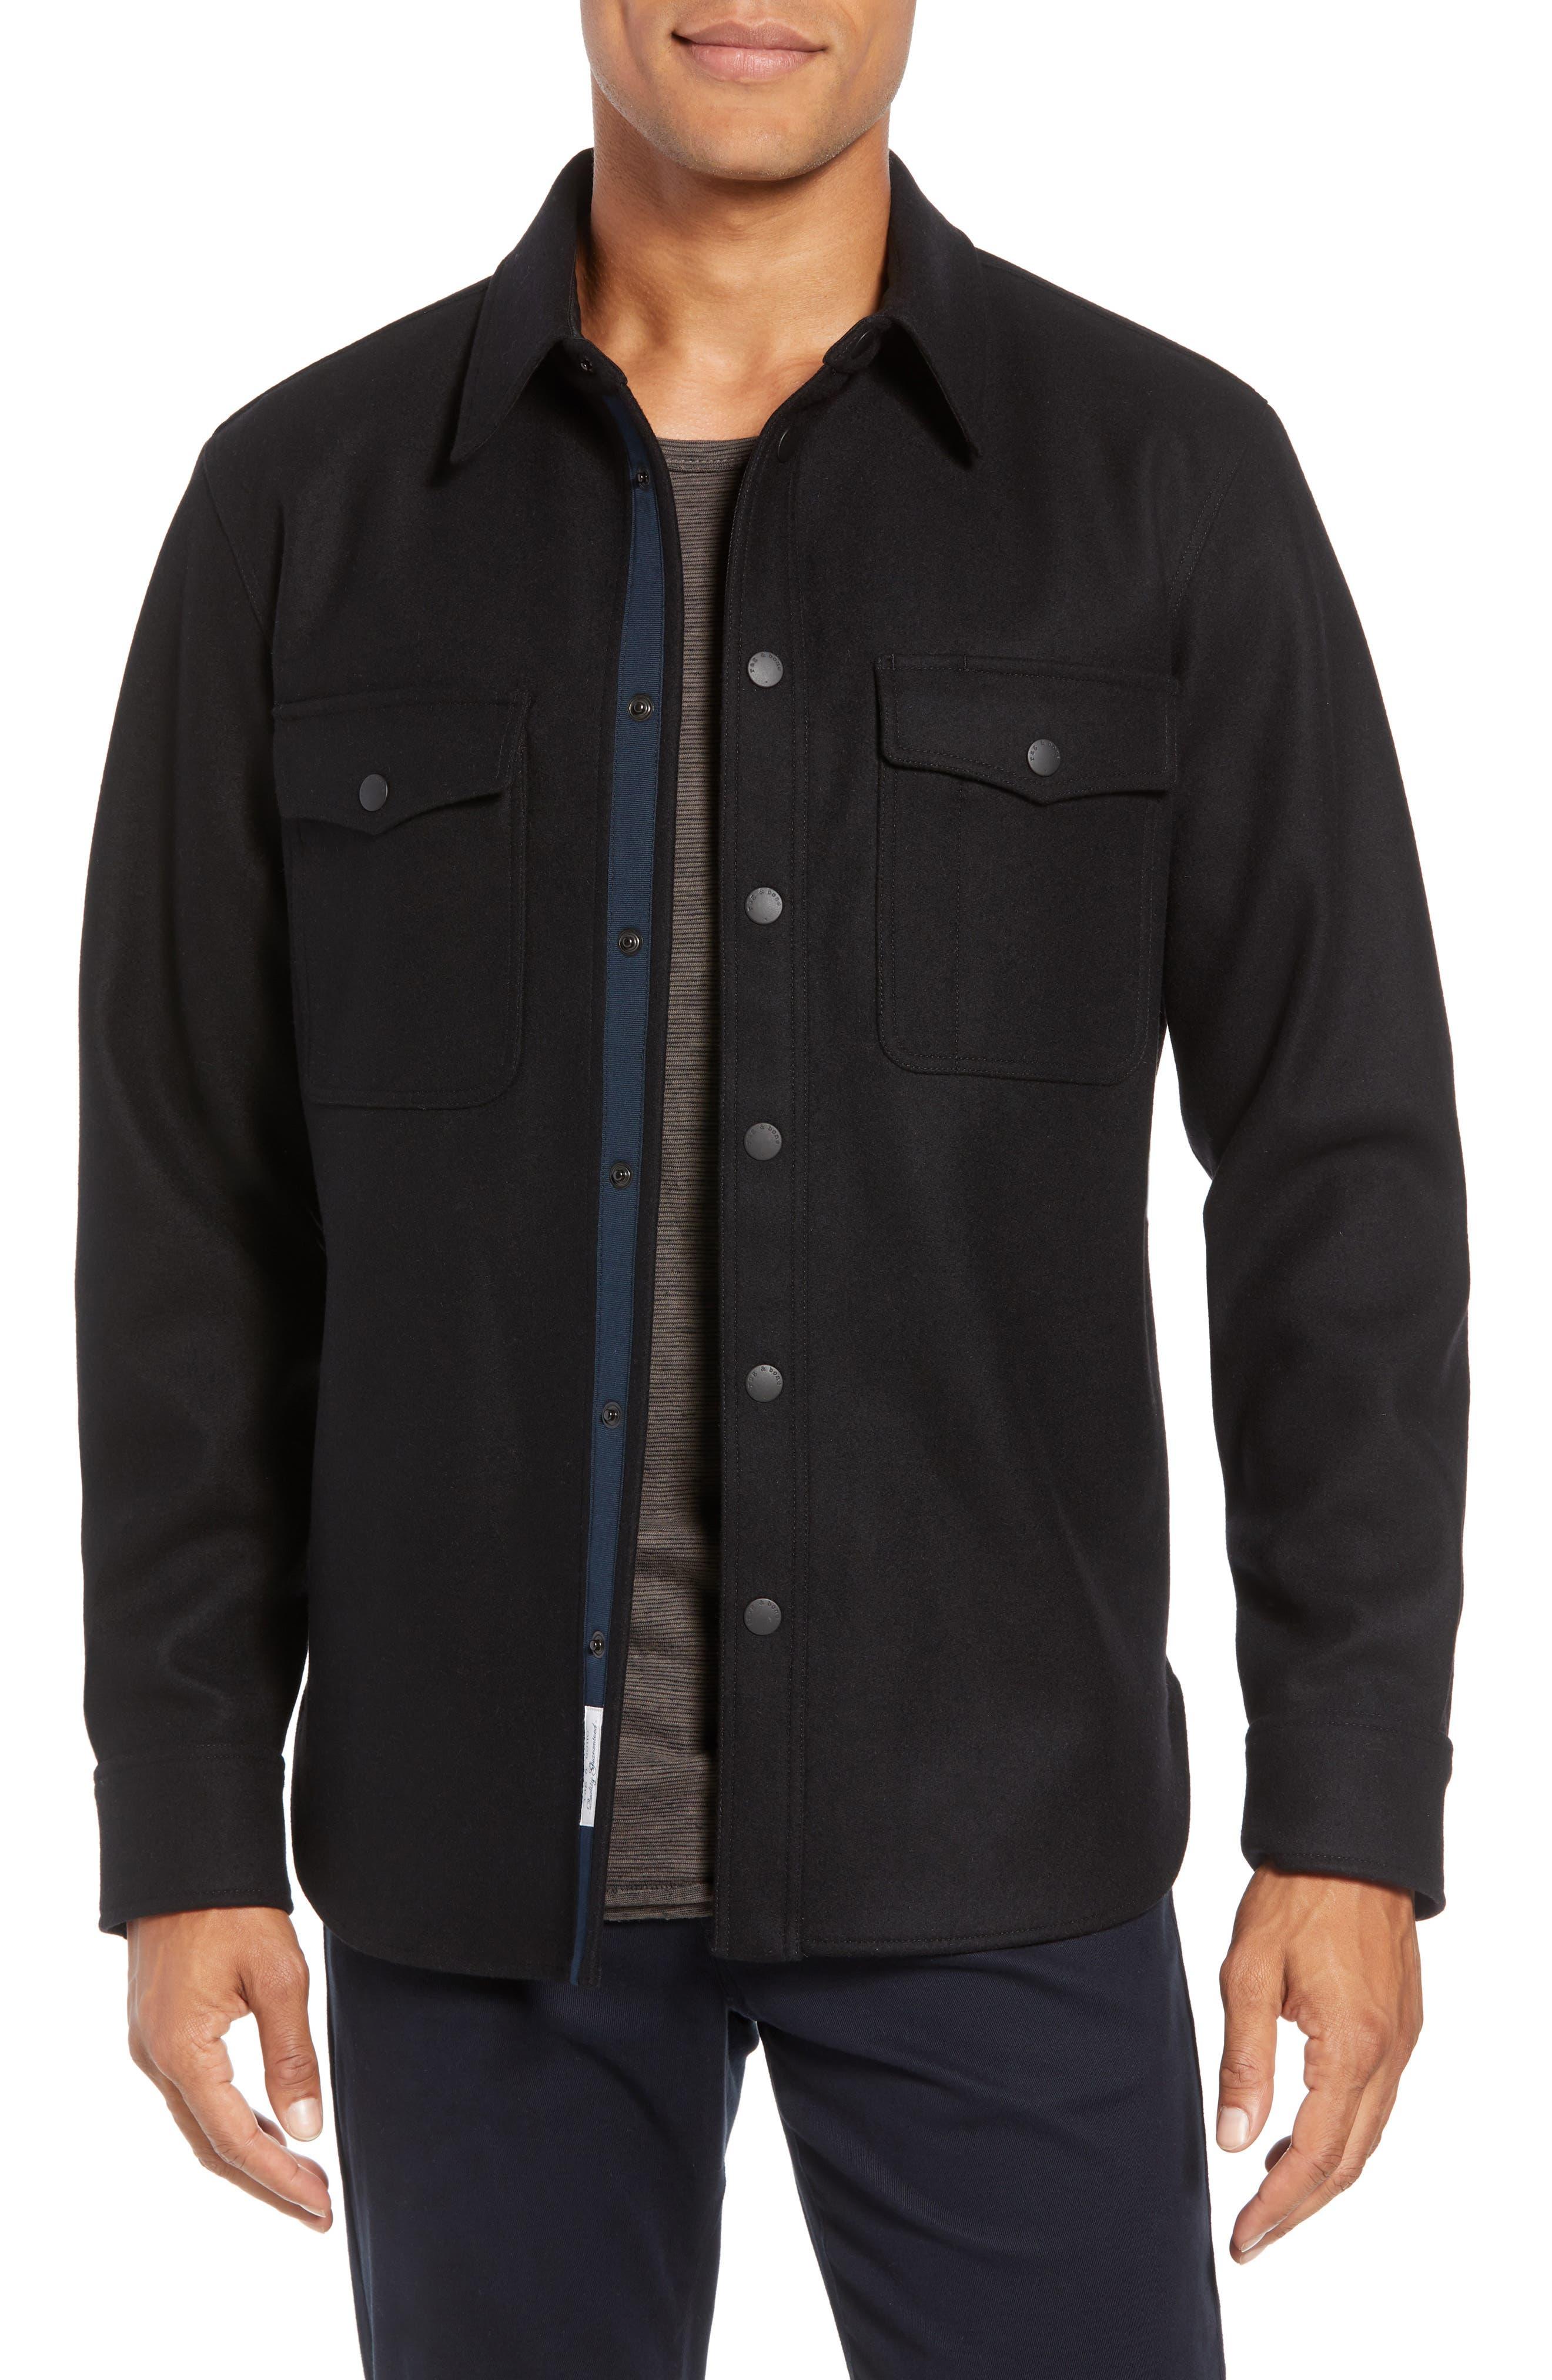 Jack Regular Fit Shirt Jacket,                             Main thumbnail 1, color,                             001